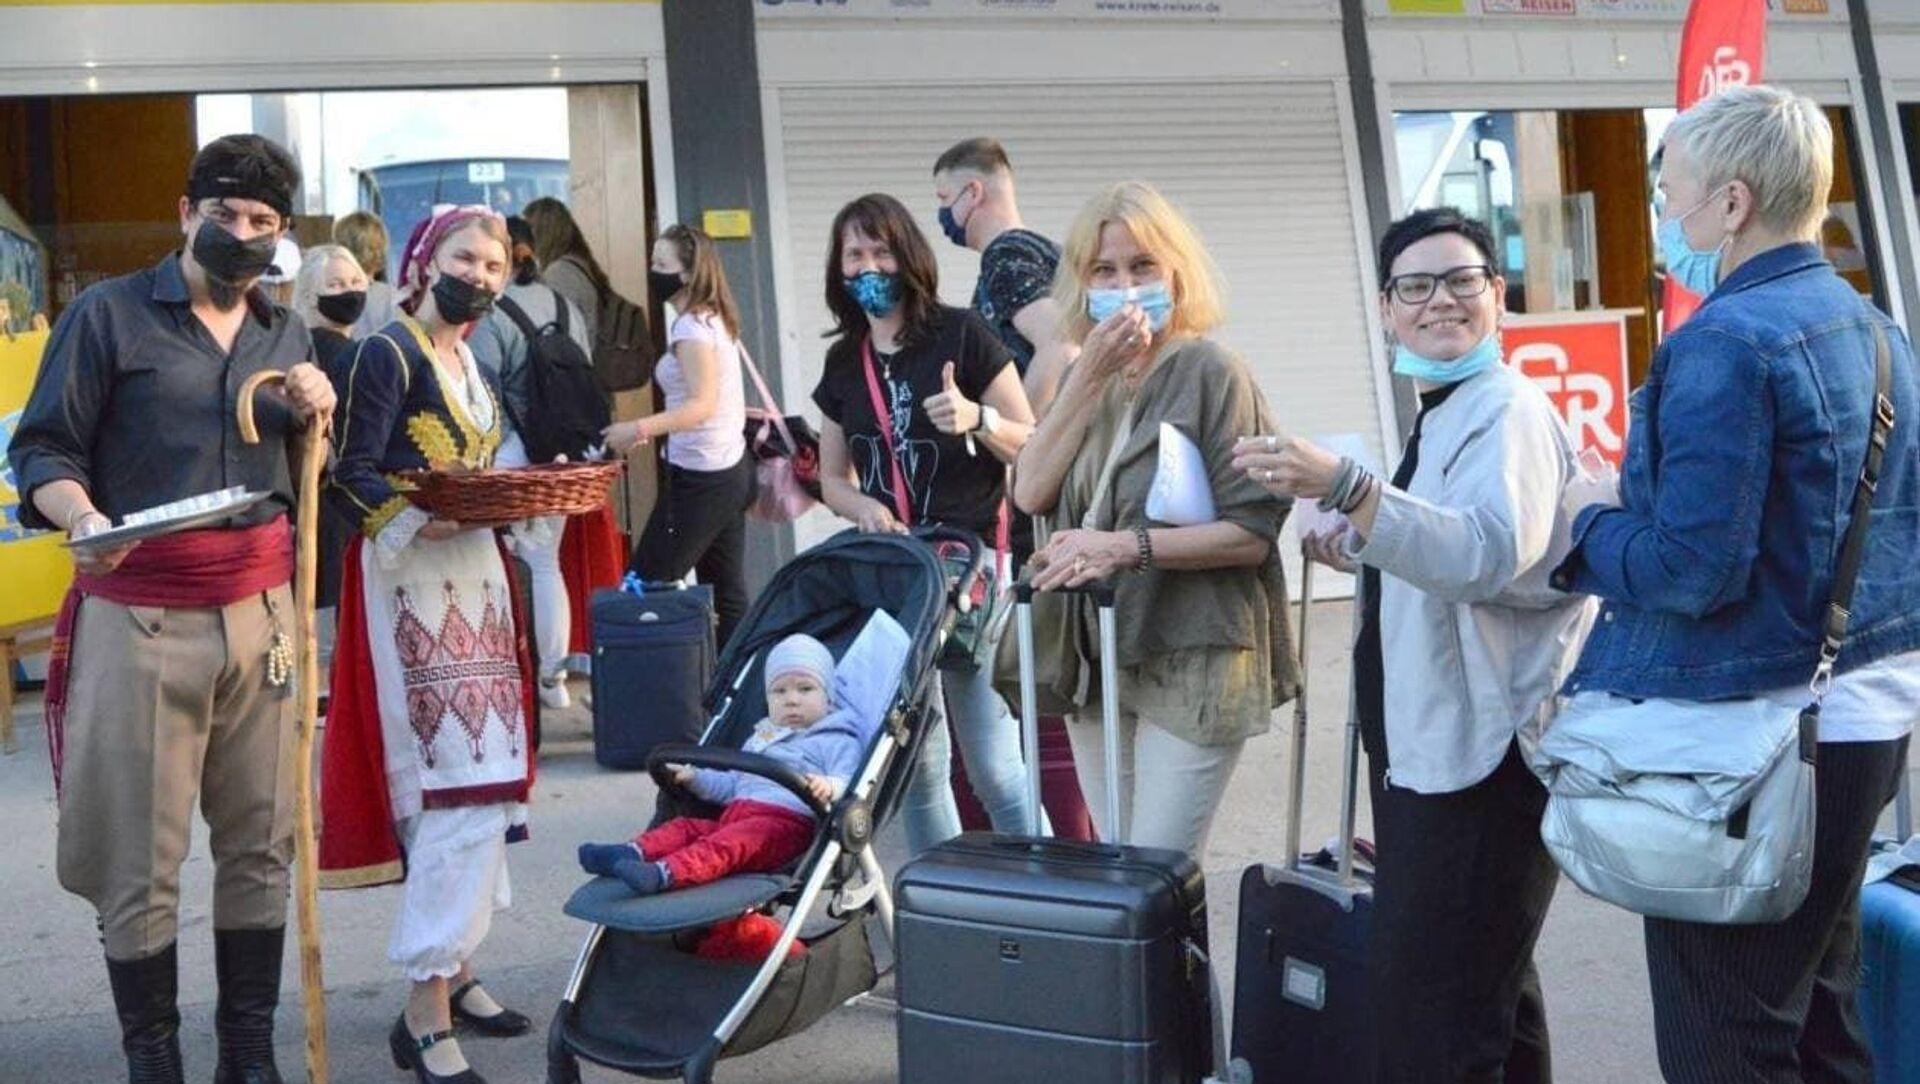 Туристов встречают в аэропорту Греции - Sputnik Беларусь, 1920, 16.05.2021